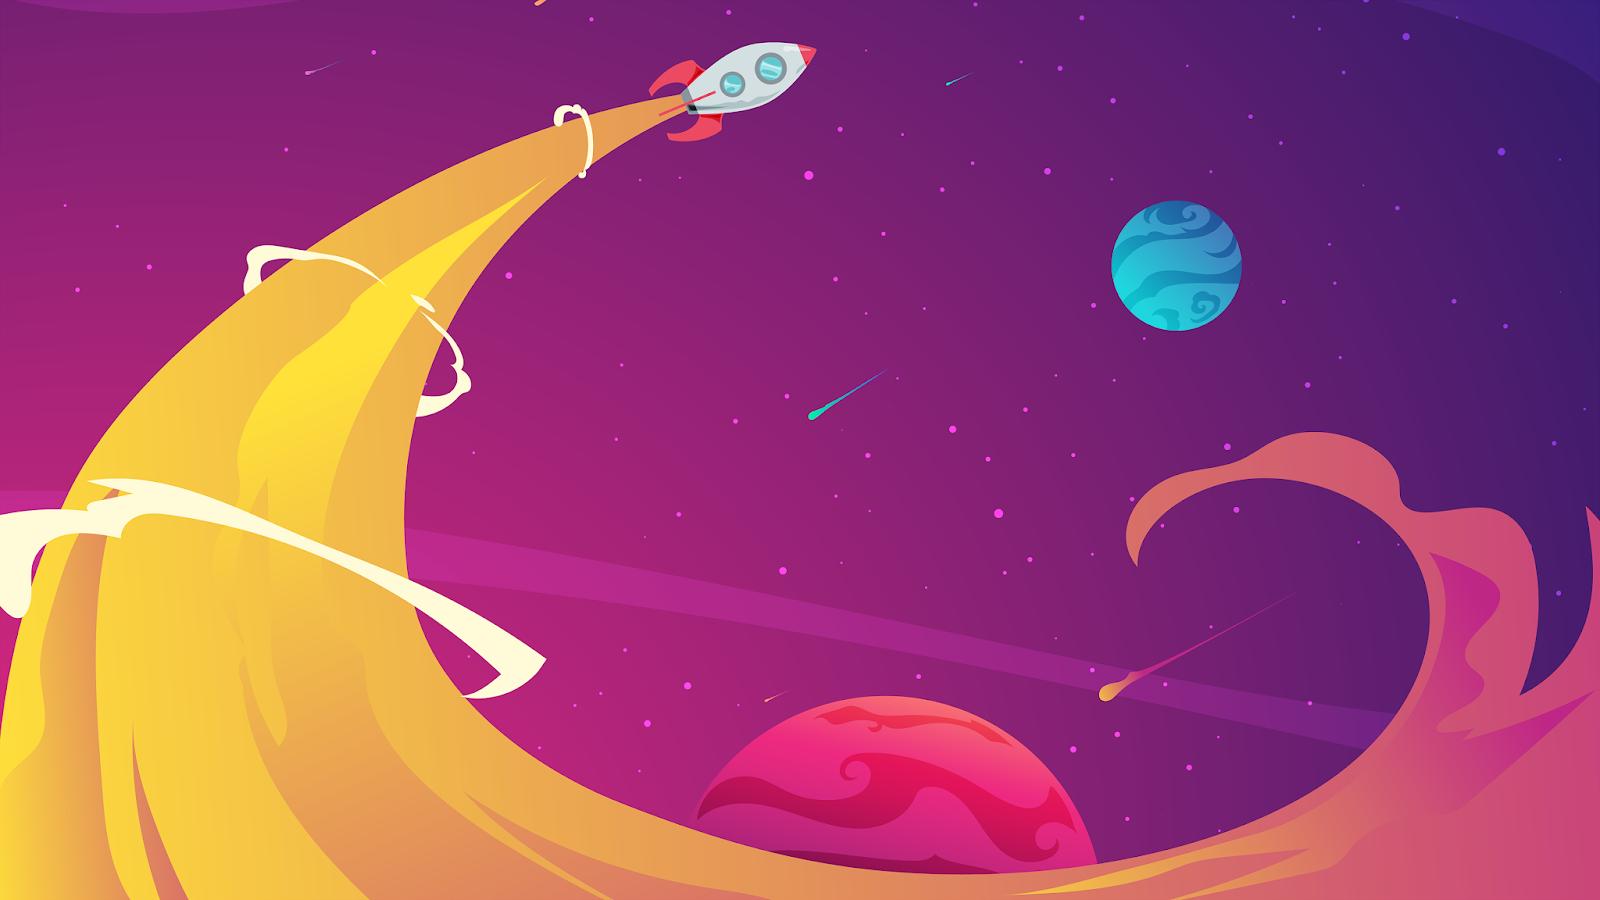 A illustration of a rocket launch in 4K Wallpaper for desktop 4k monitor